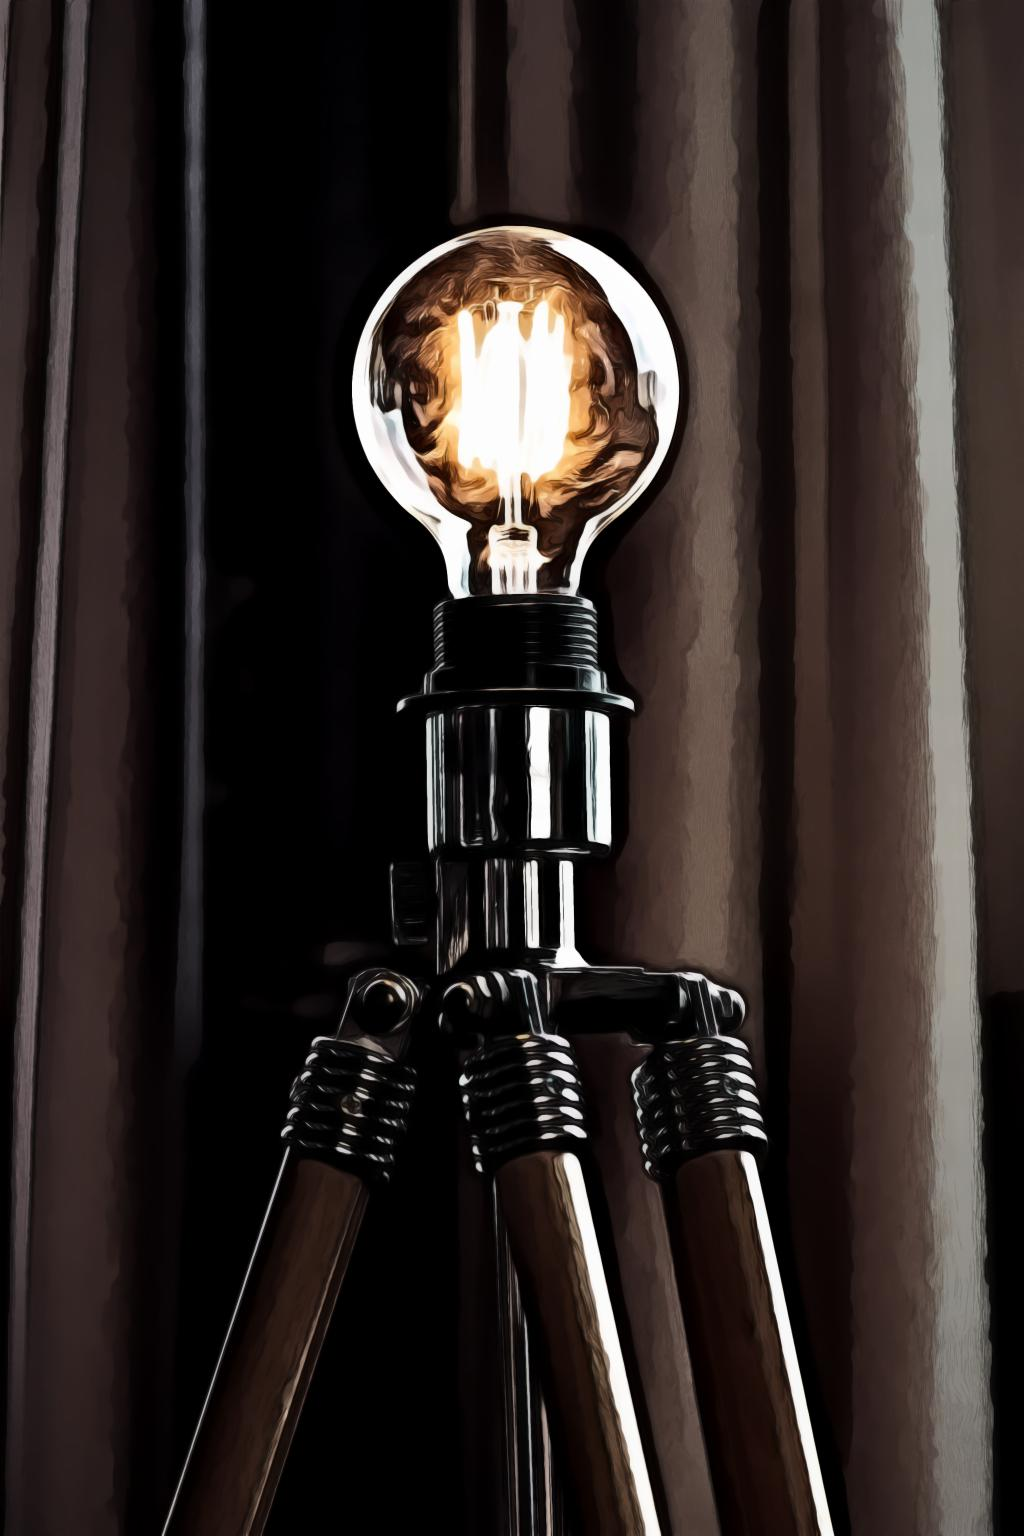 Well lit light bulb